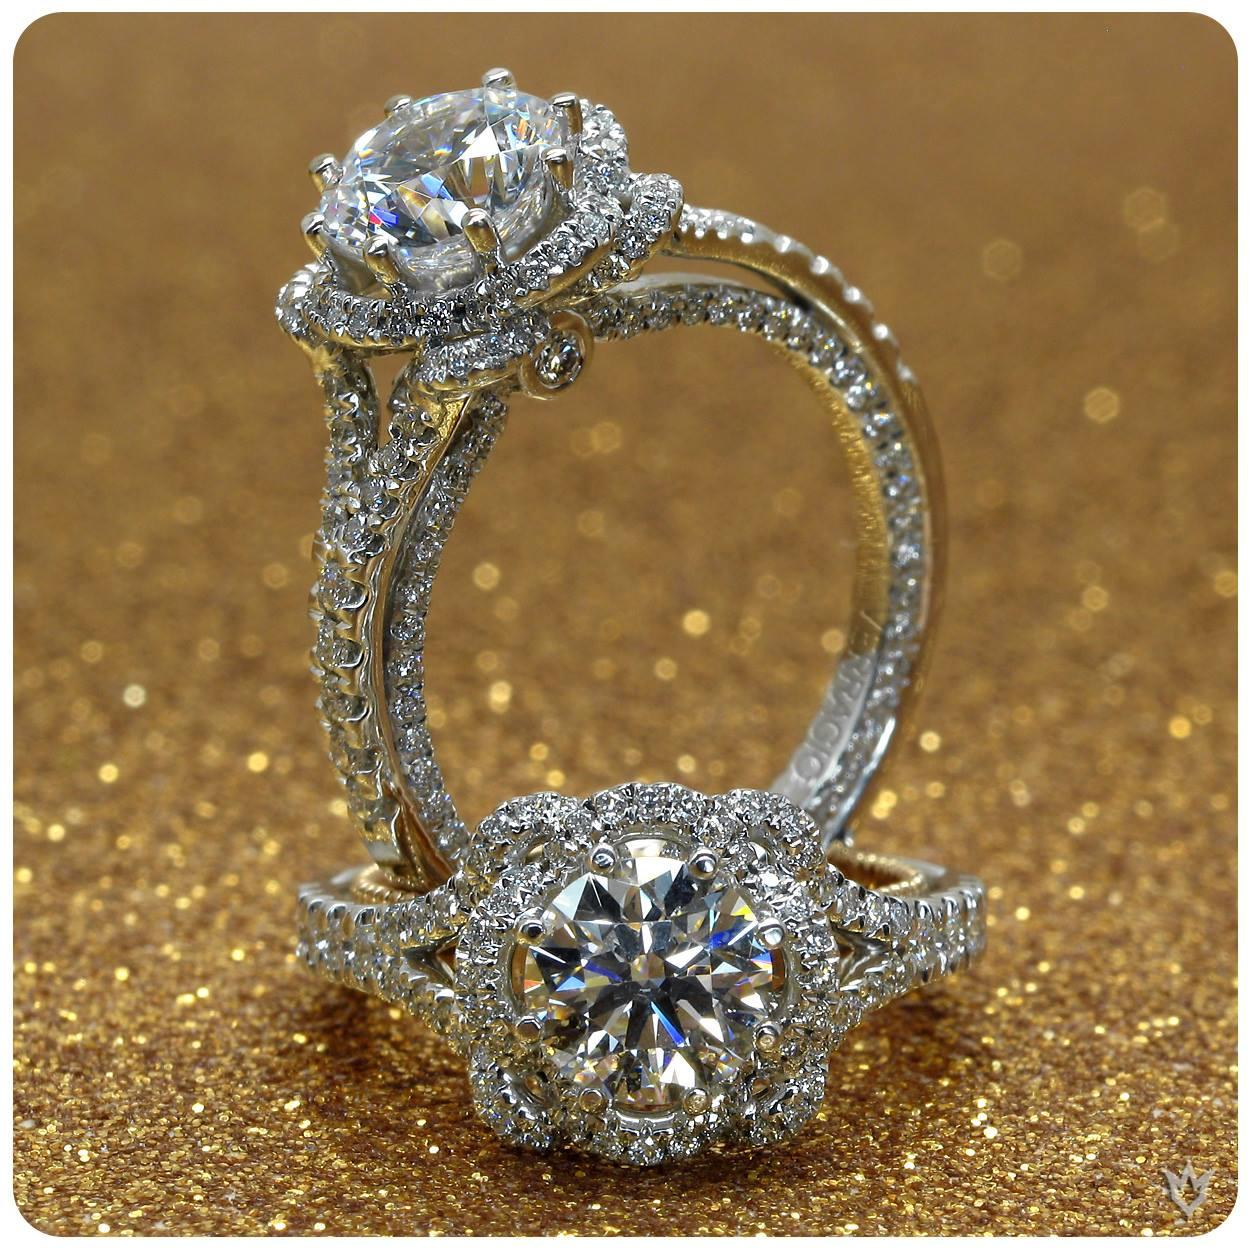 Emerald Lady Jewelry image 95